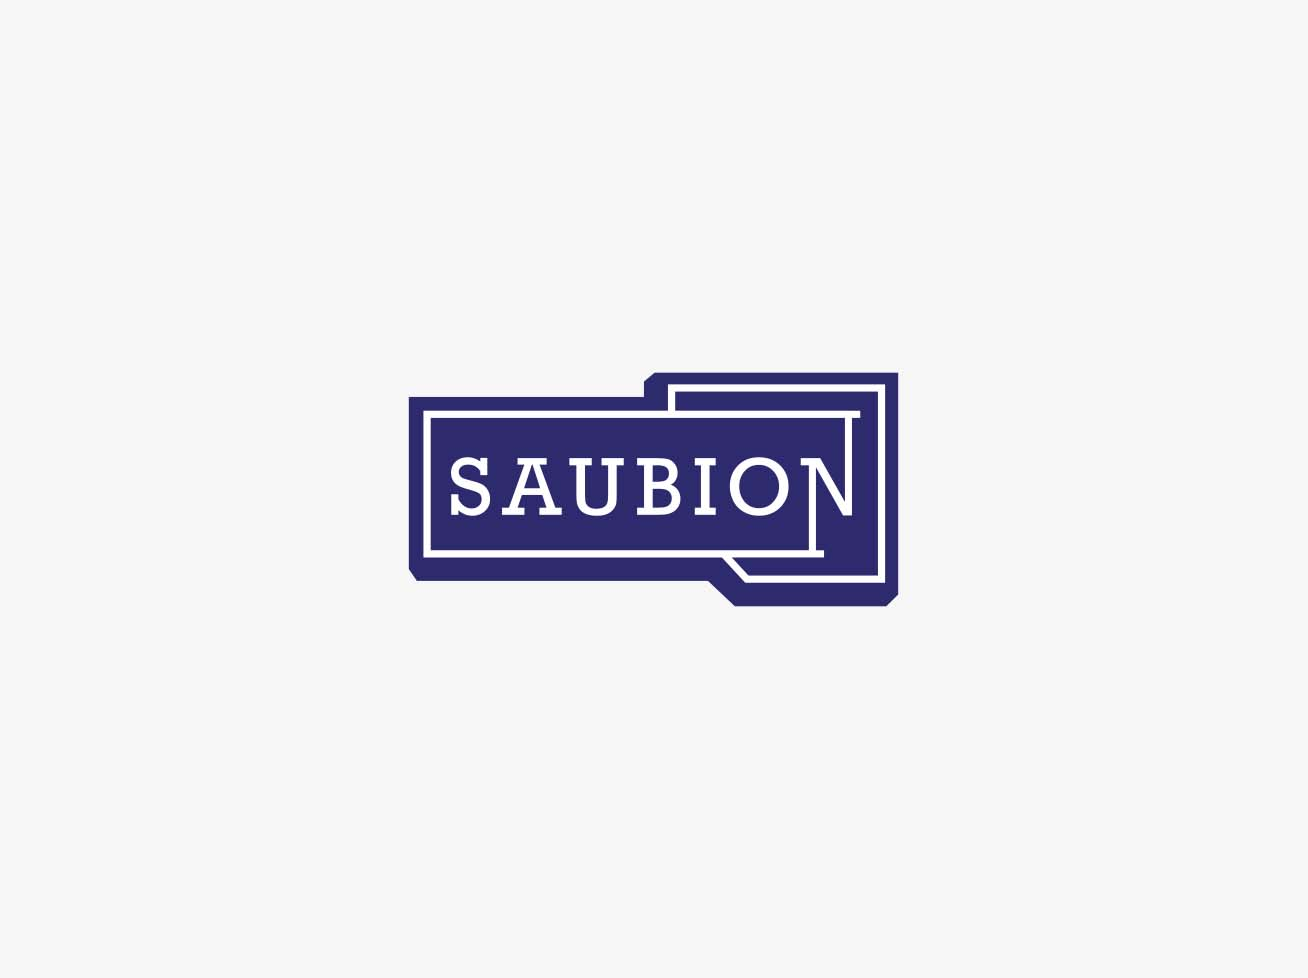 Saubion